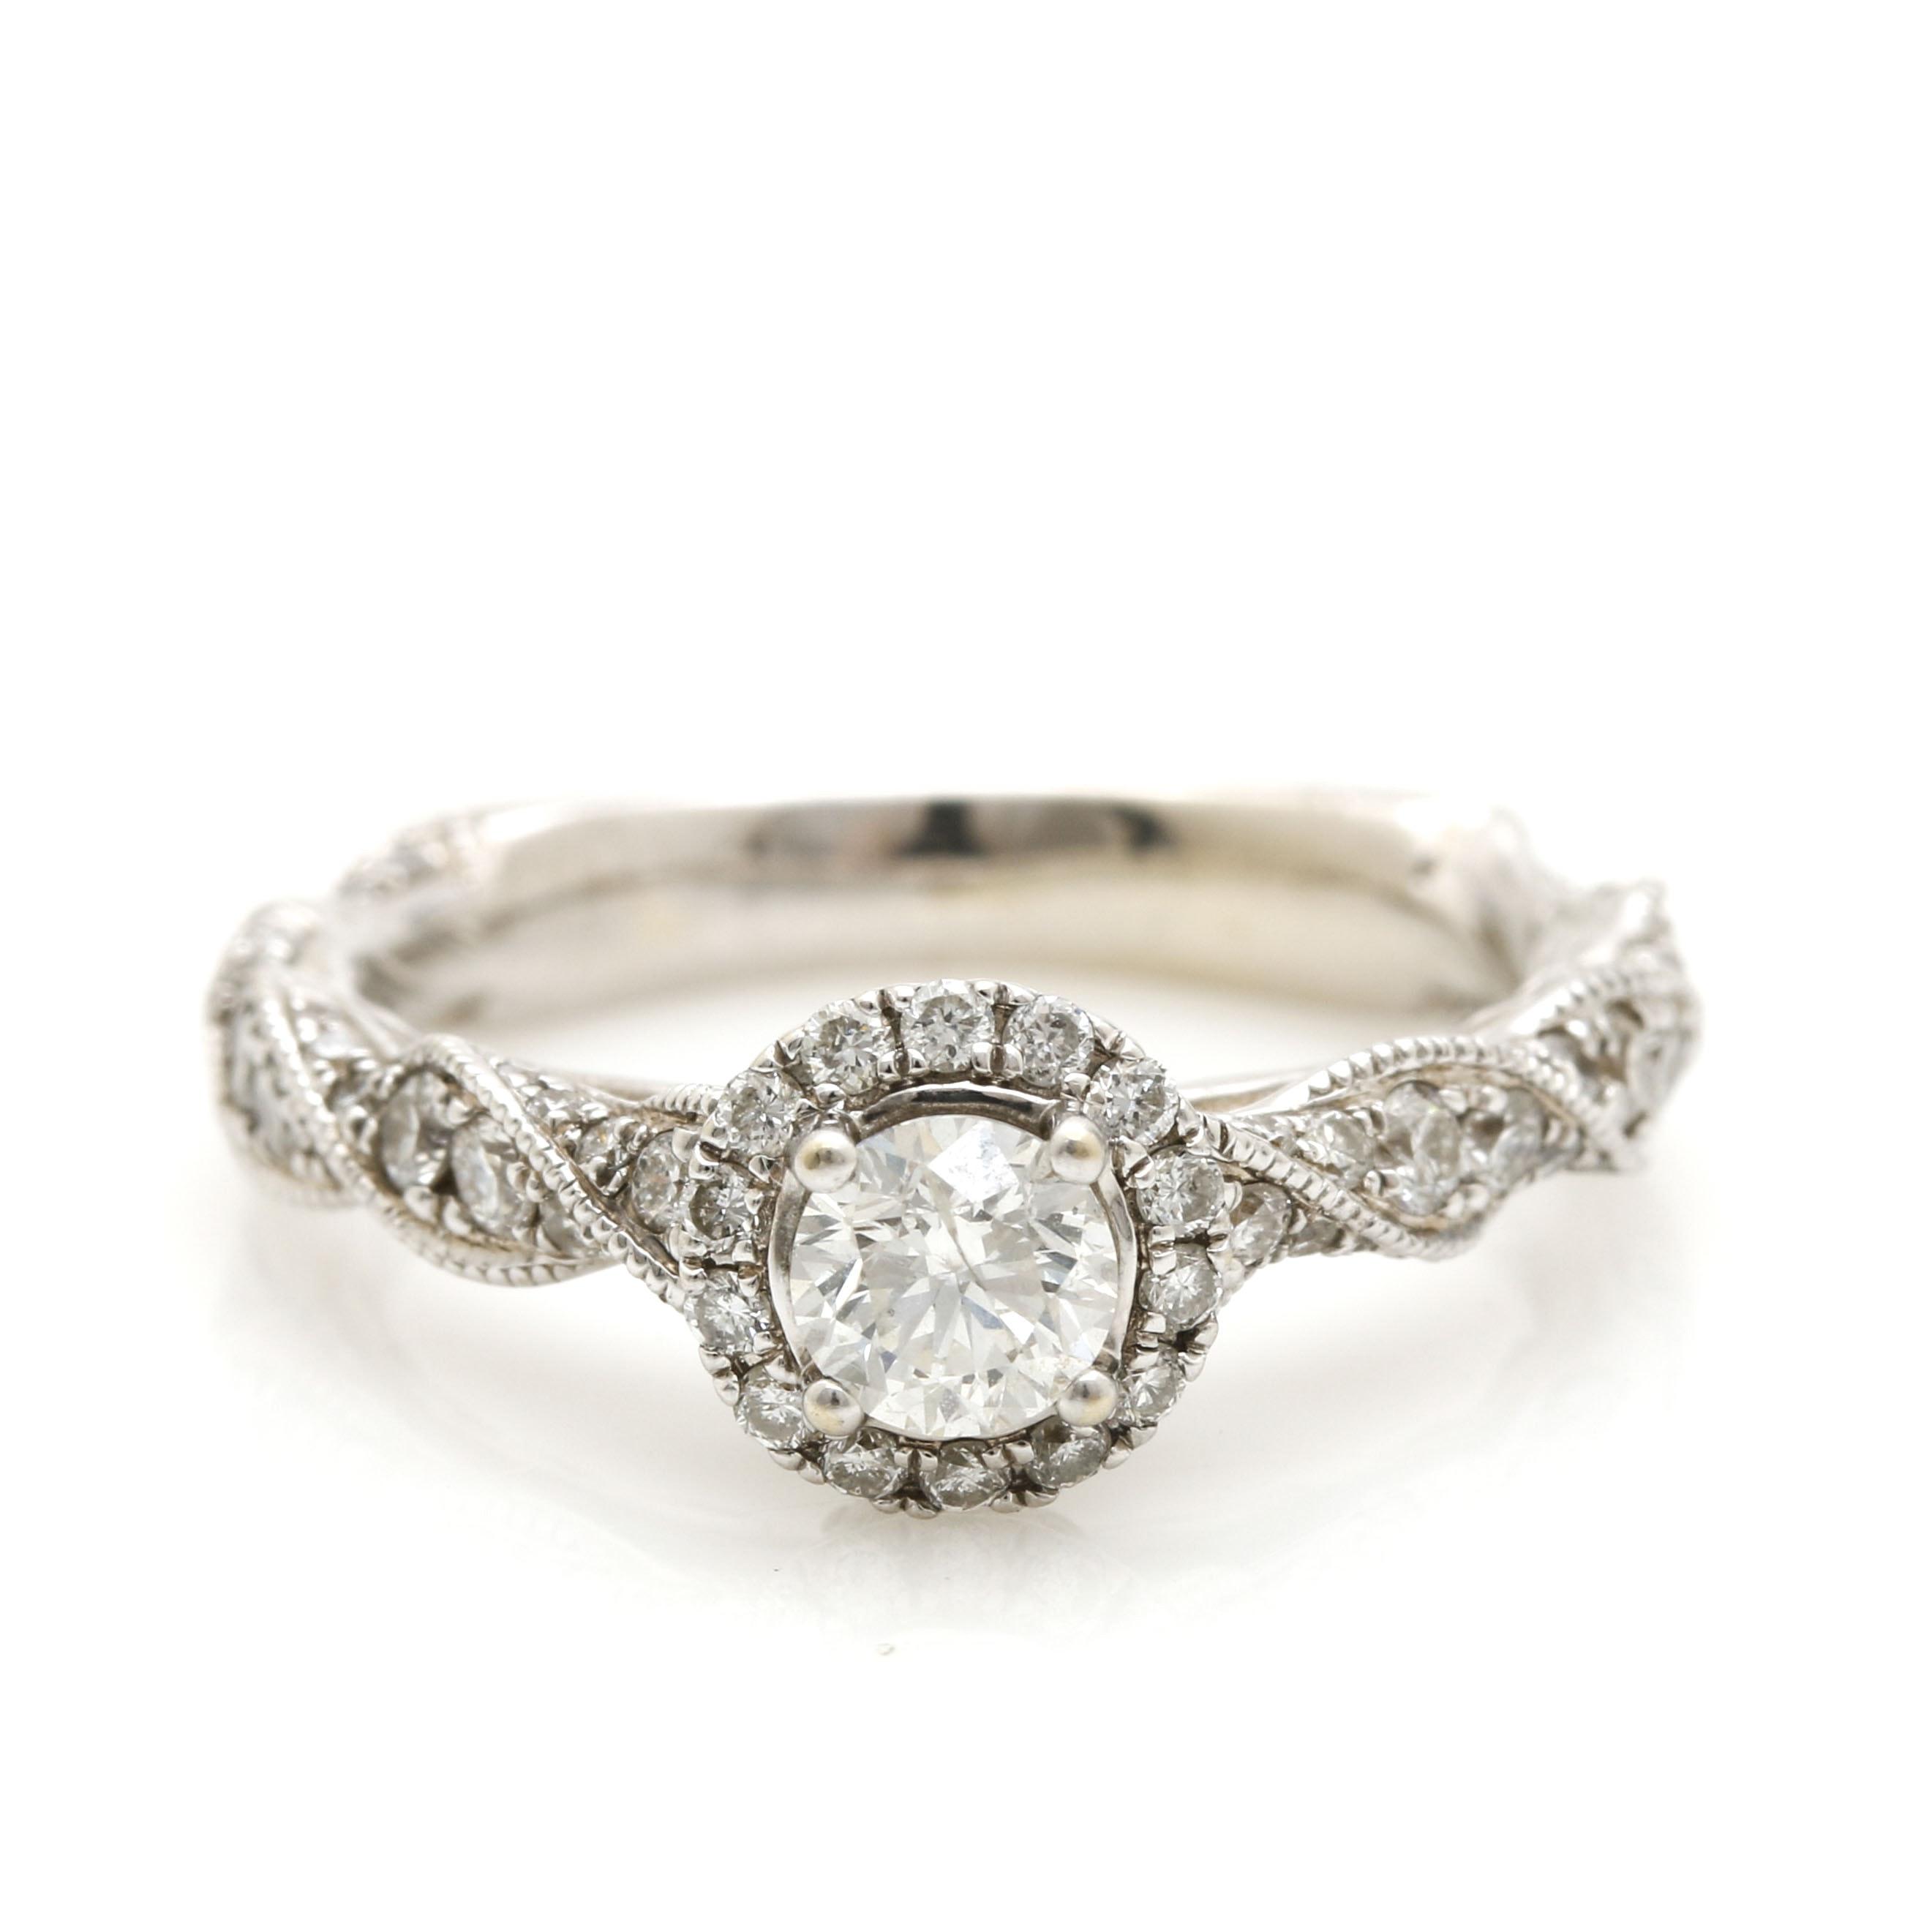 14K White Gold 1.35 CTW Diamond Ring